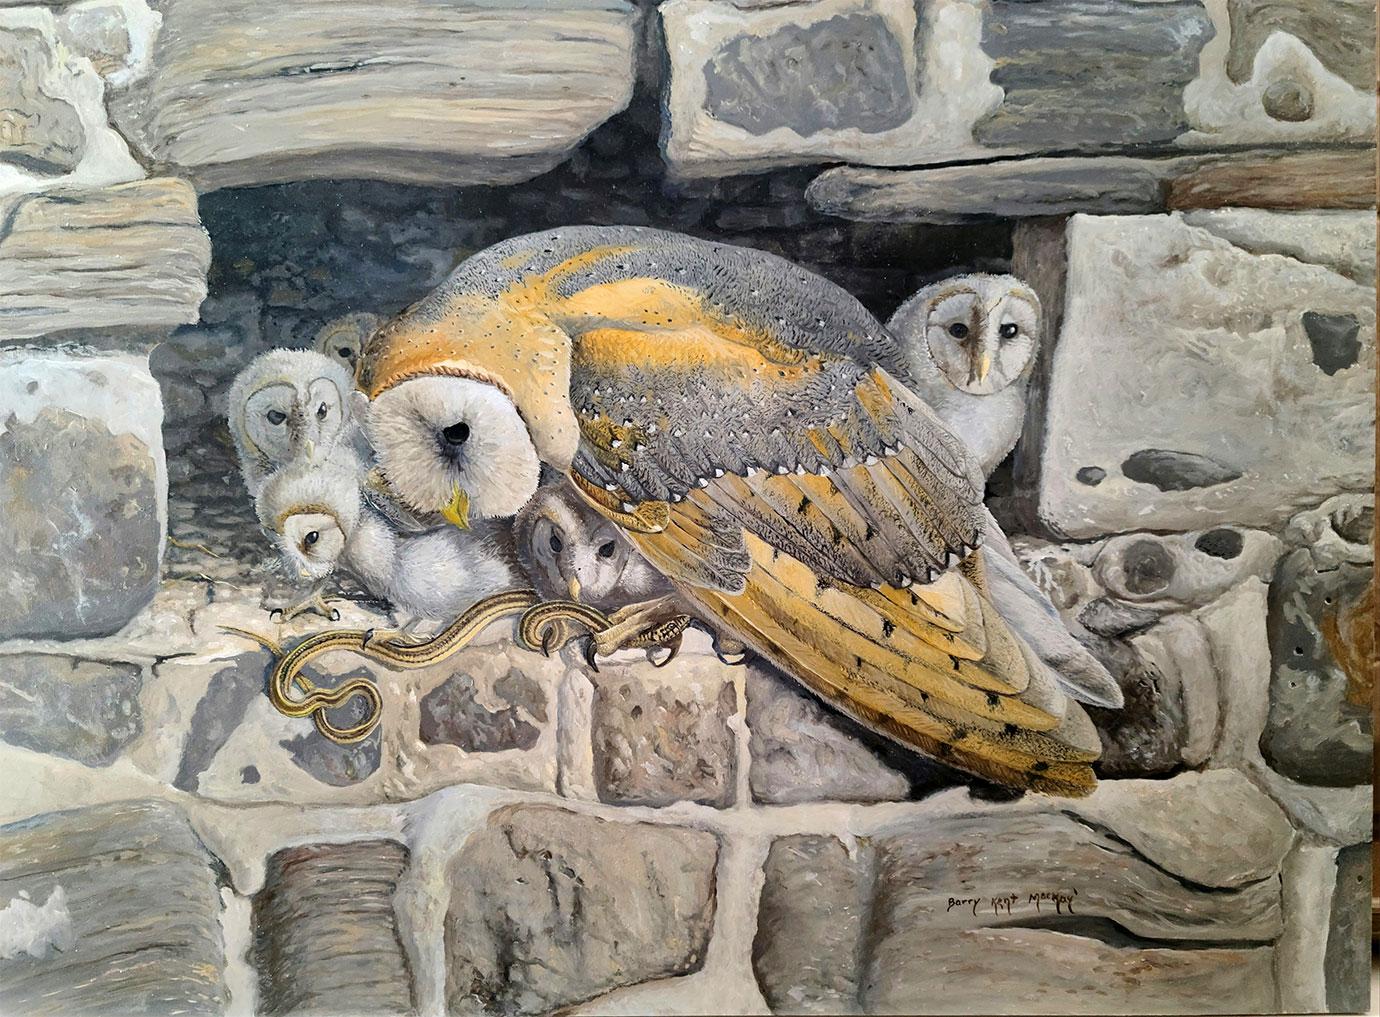 barn owl family huddled together